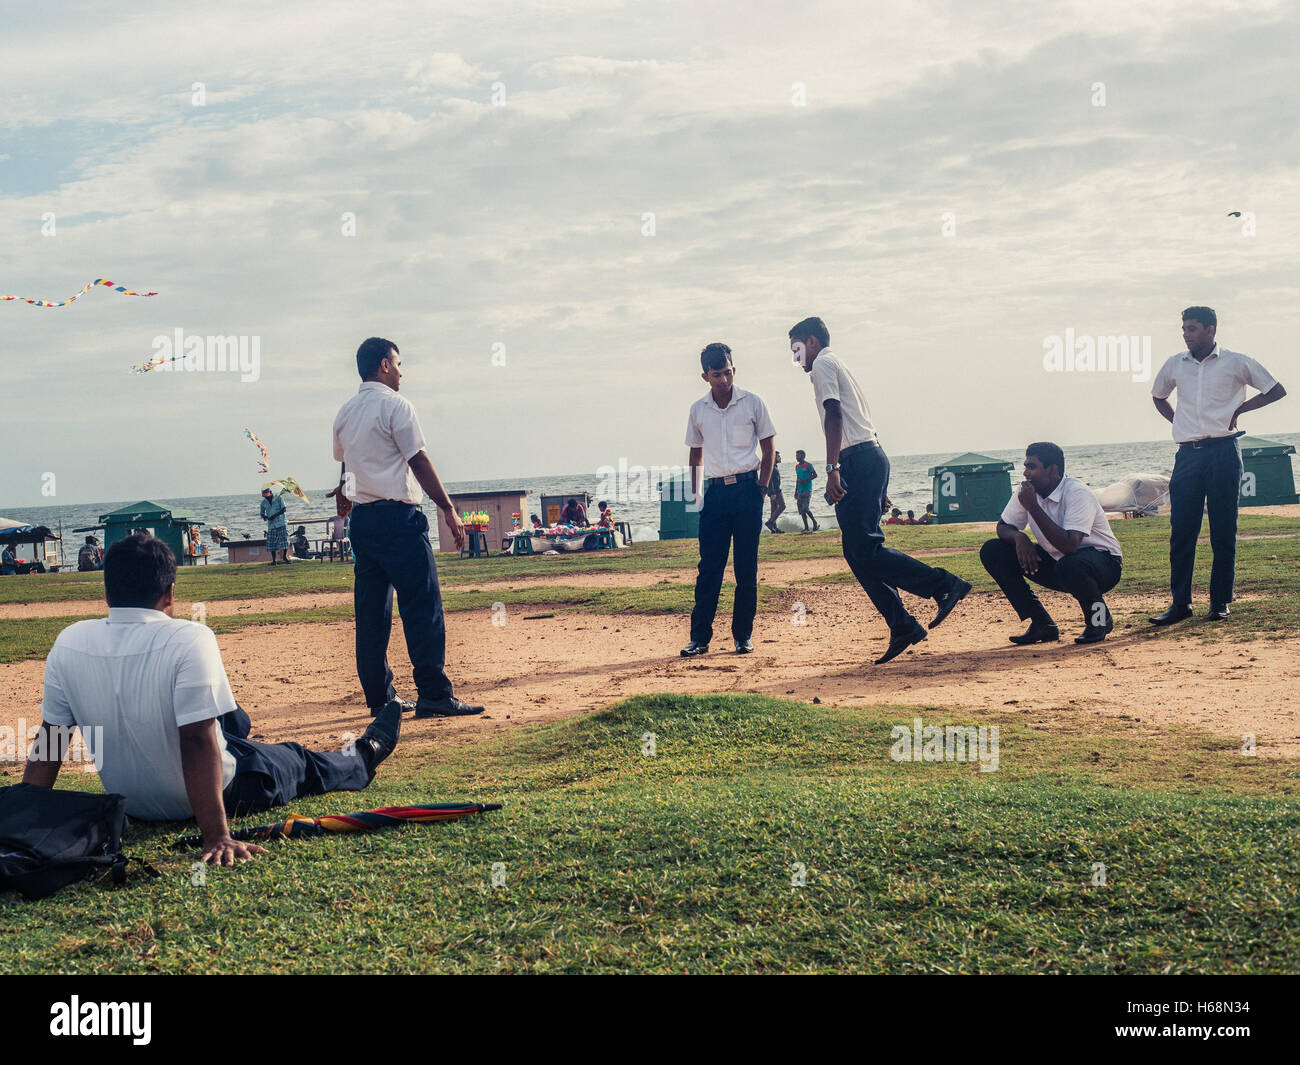 Colombo, Sri Lanka. June 10th 2016. Schoolboys play a game of hop-scotch on Galle Face Green, Sri Lanka. Stock Photo